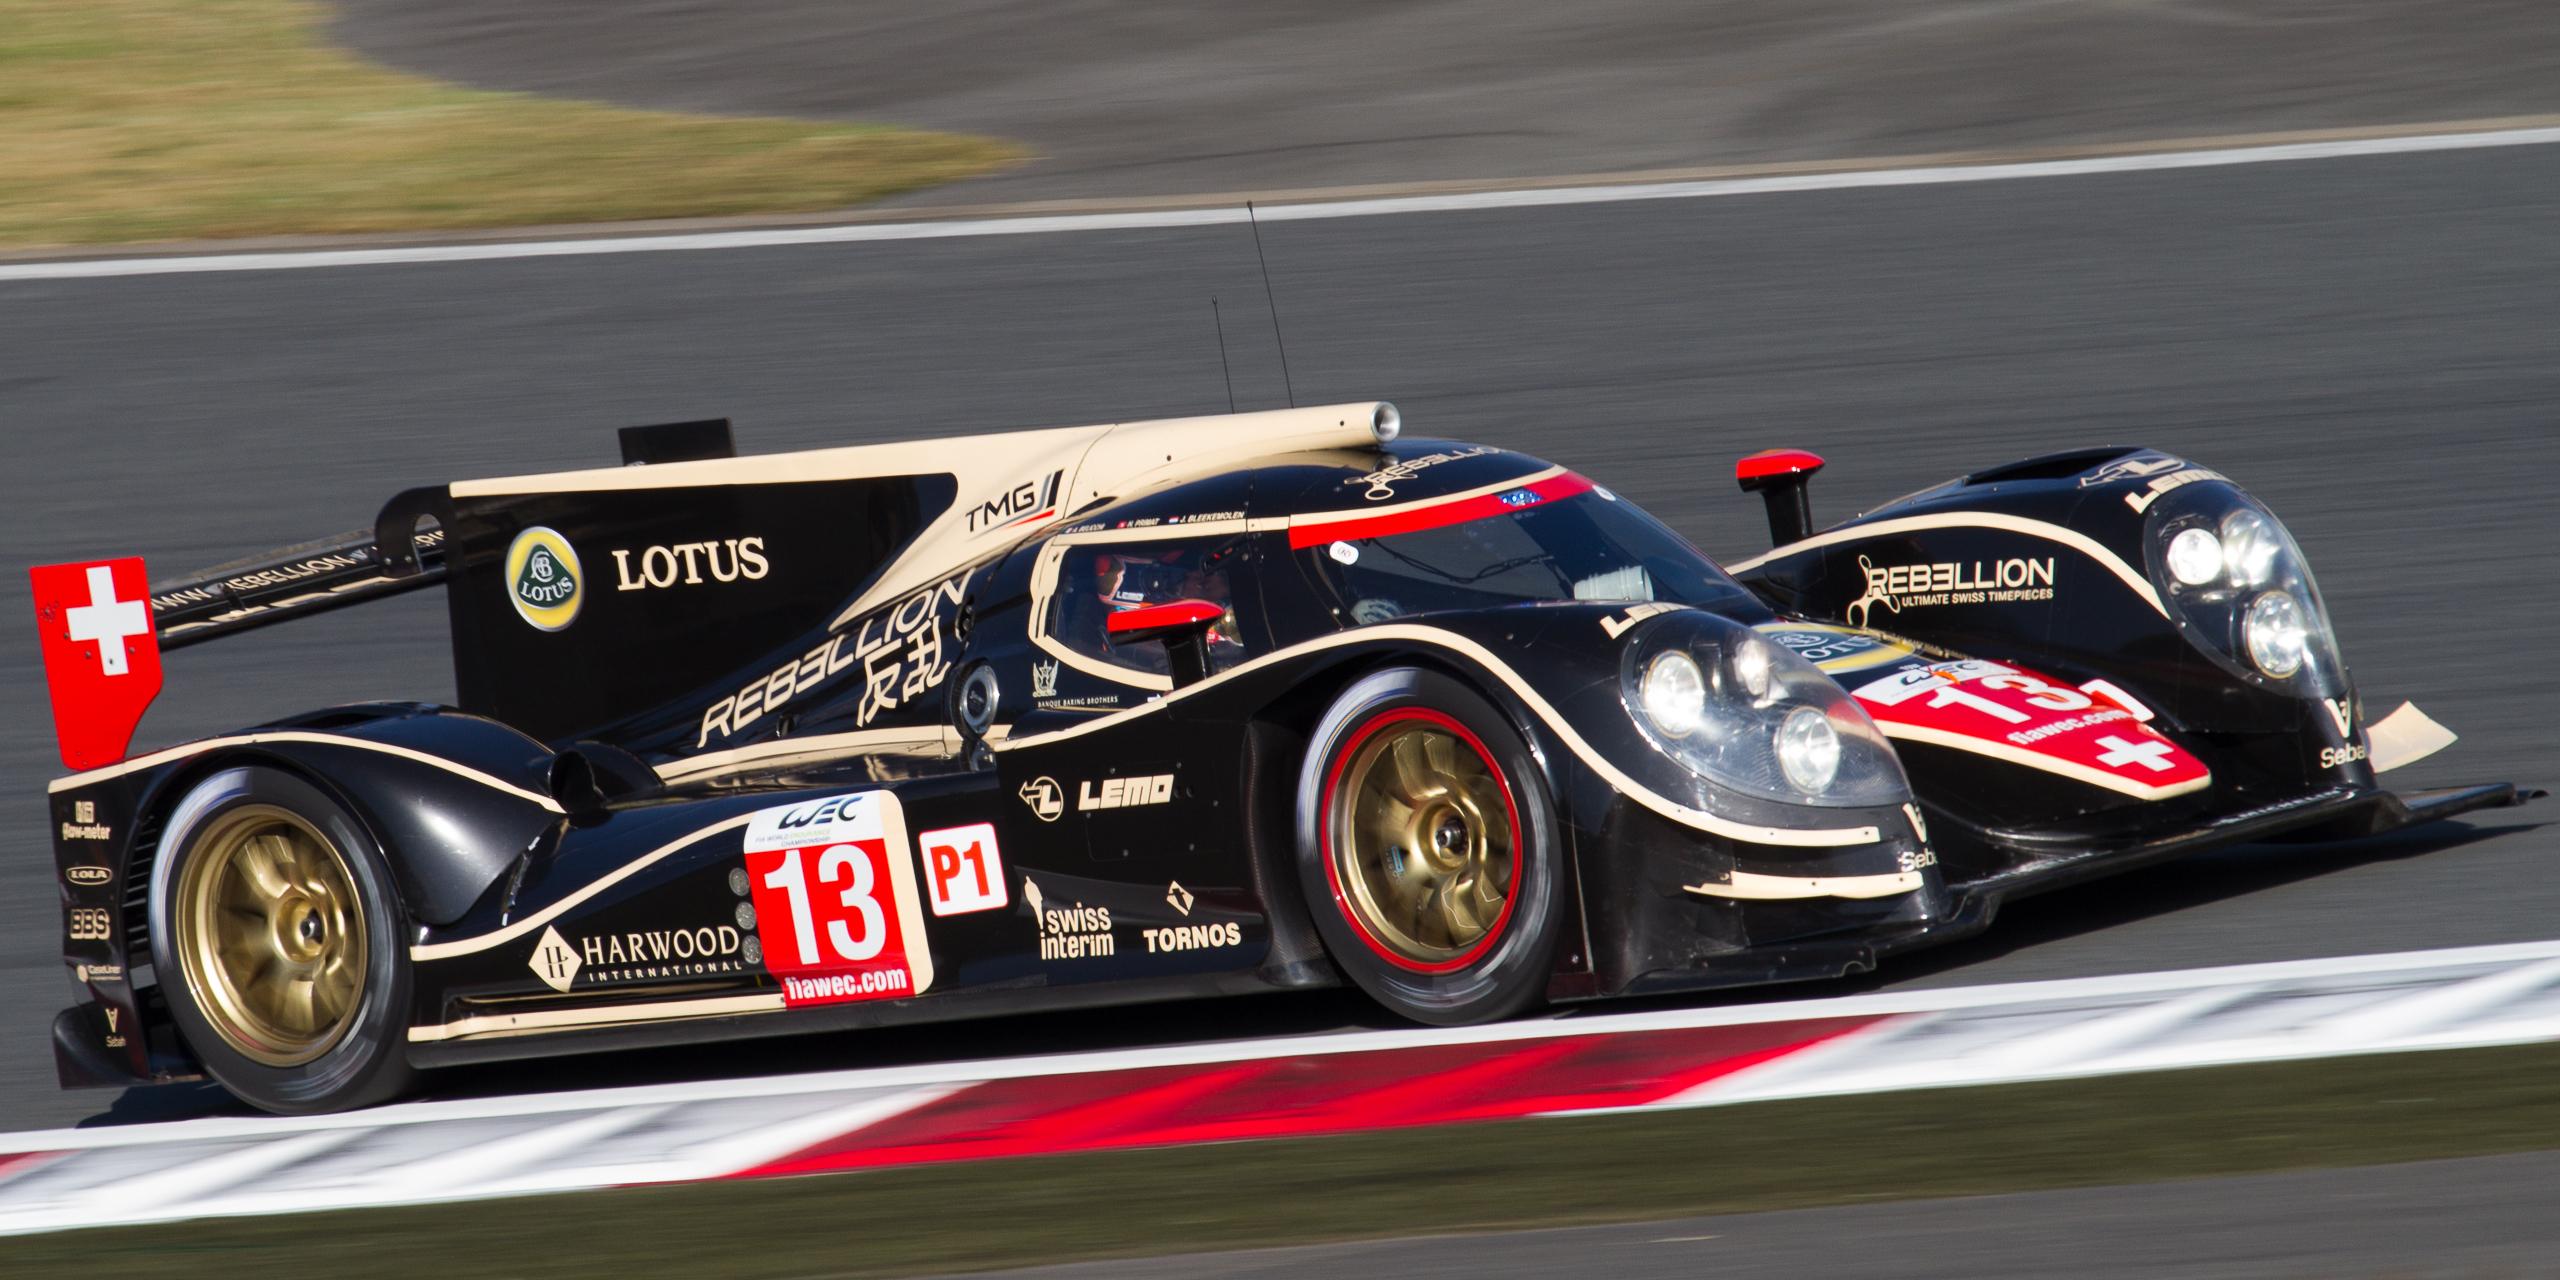 Lola_B12-60_%28Rebellion_Racing%2C_Andrea_Belicchi%29_2012_WEC_Fuji.jpg